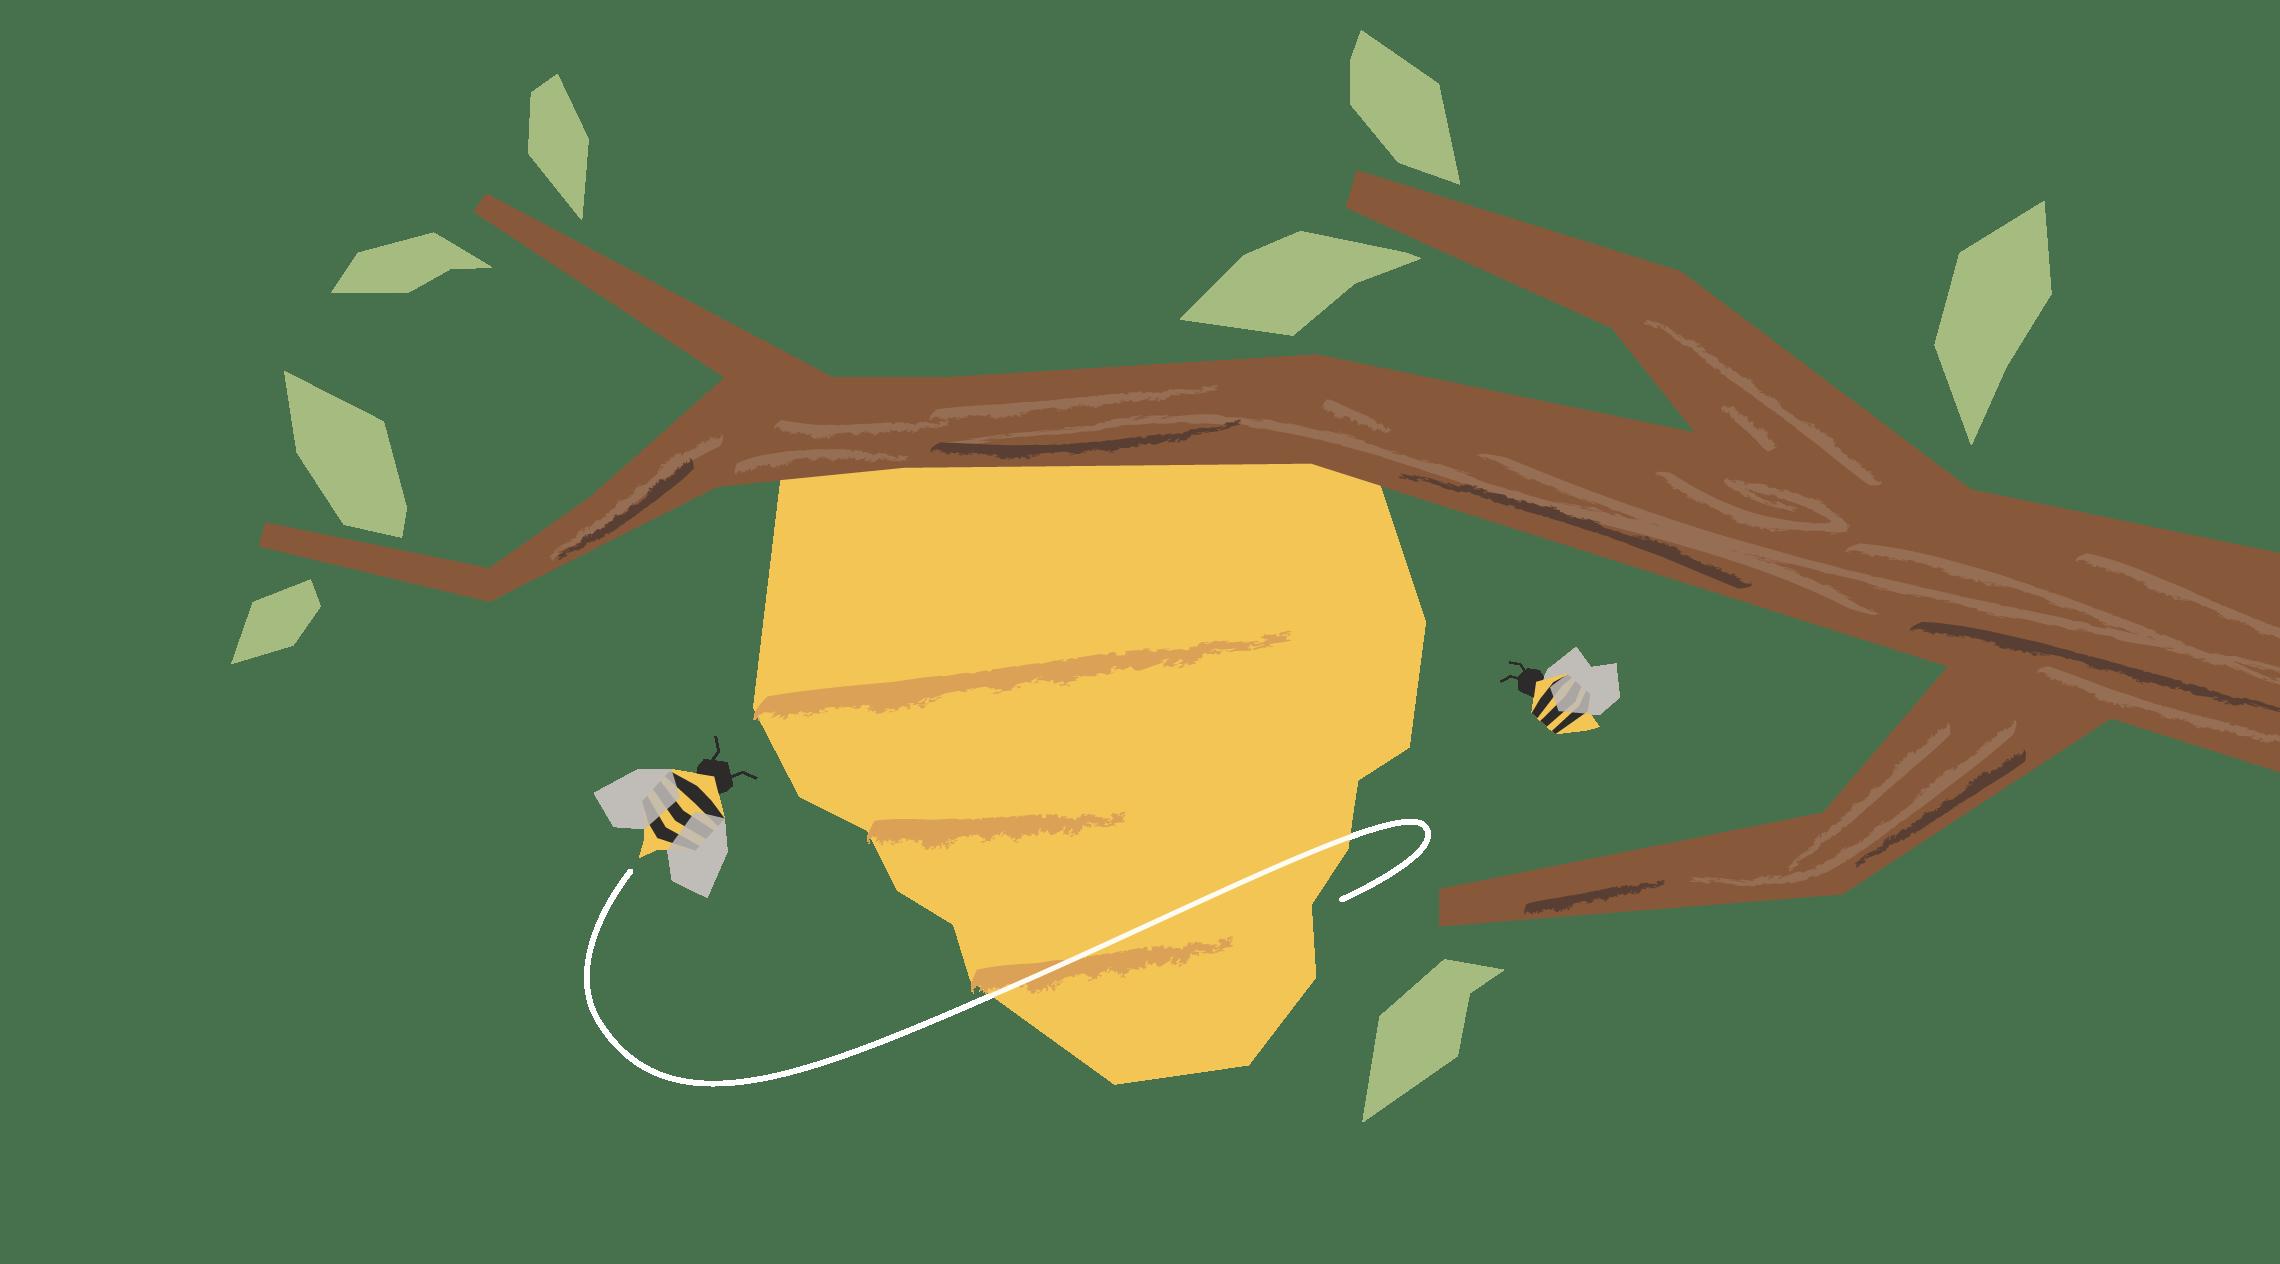 The Woods - by Mohit Rao, illustration by Akshaya Zachariah